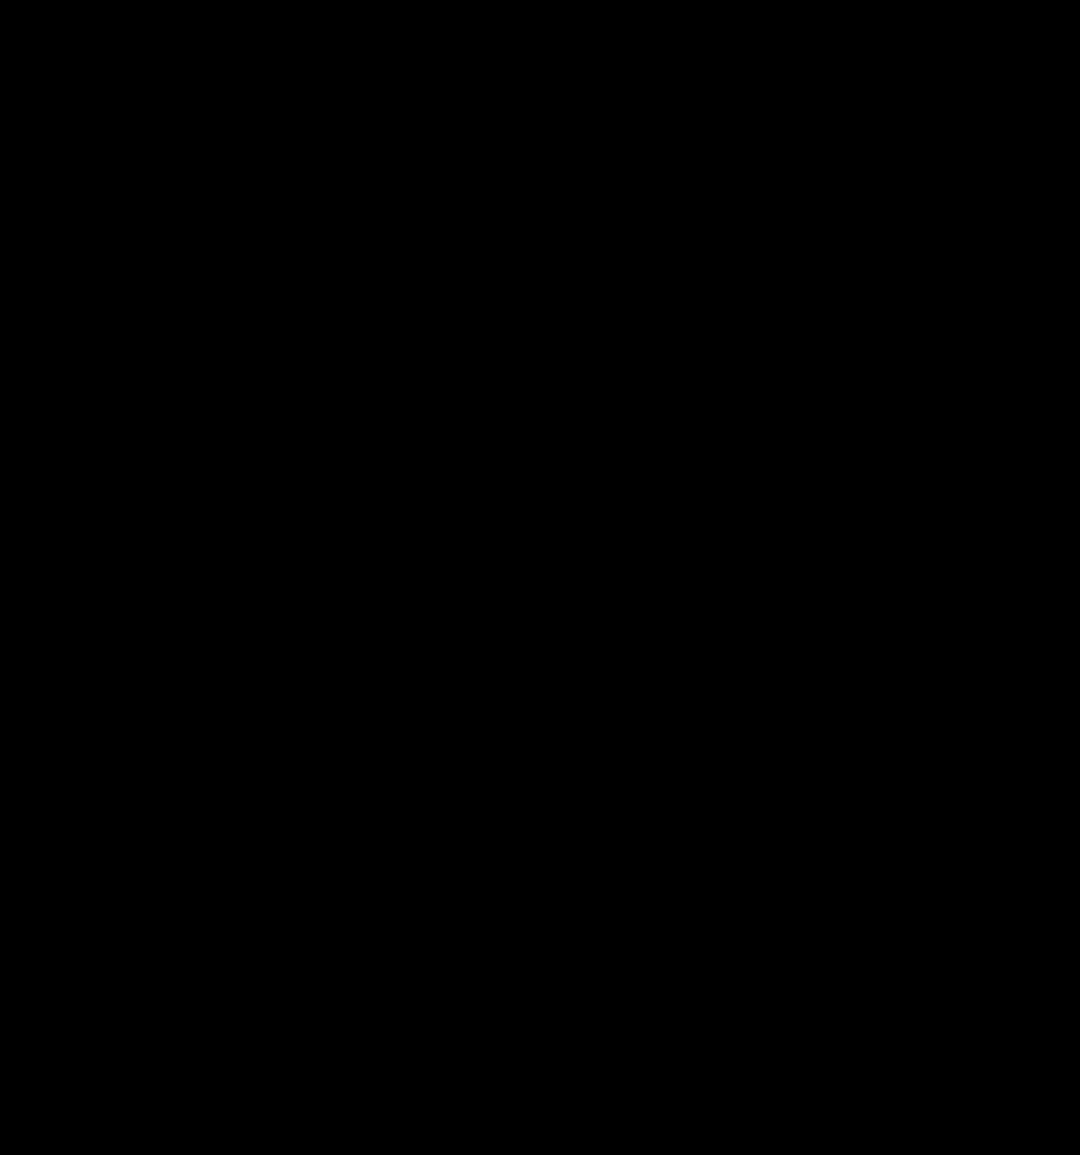 panel-carni-trim_2000x.png